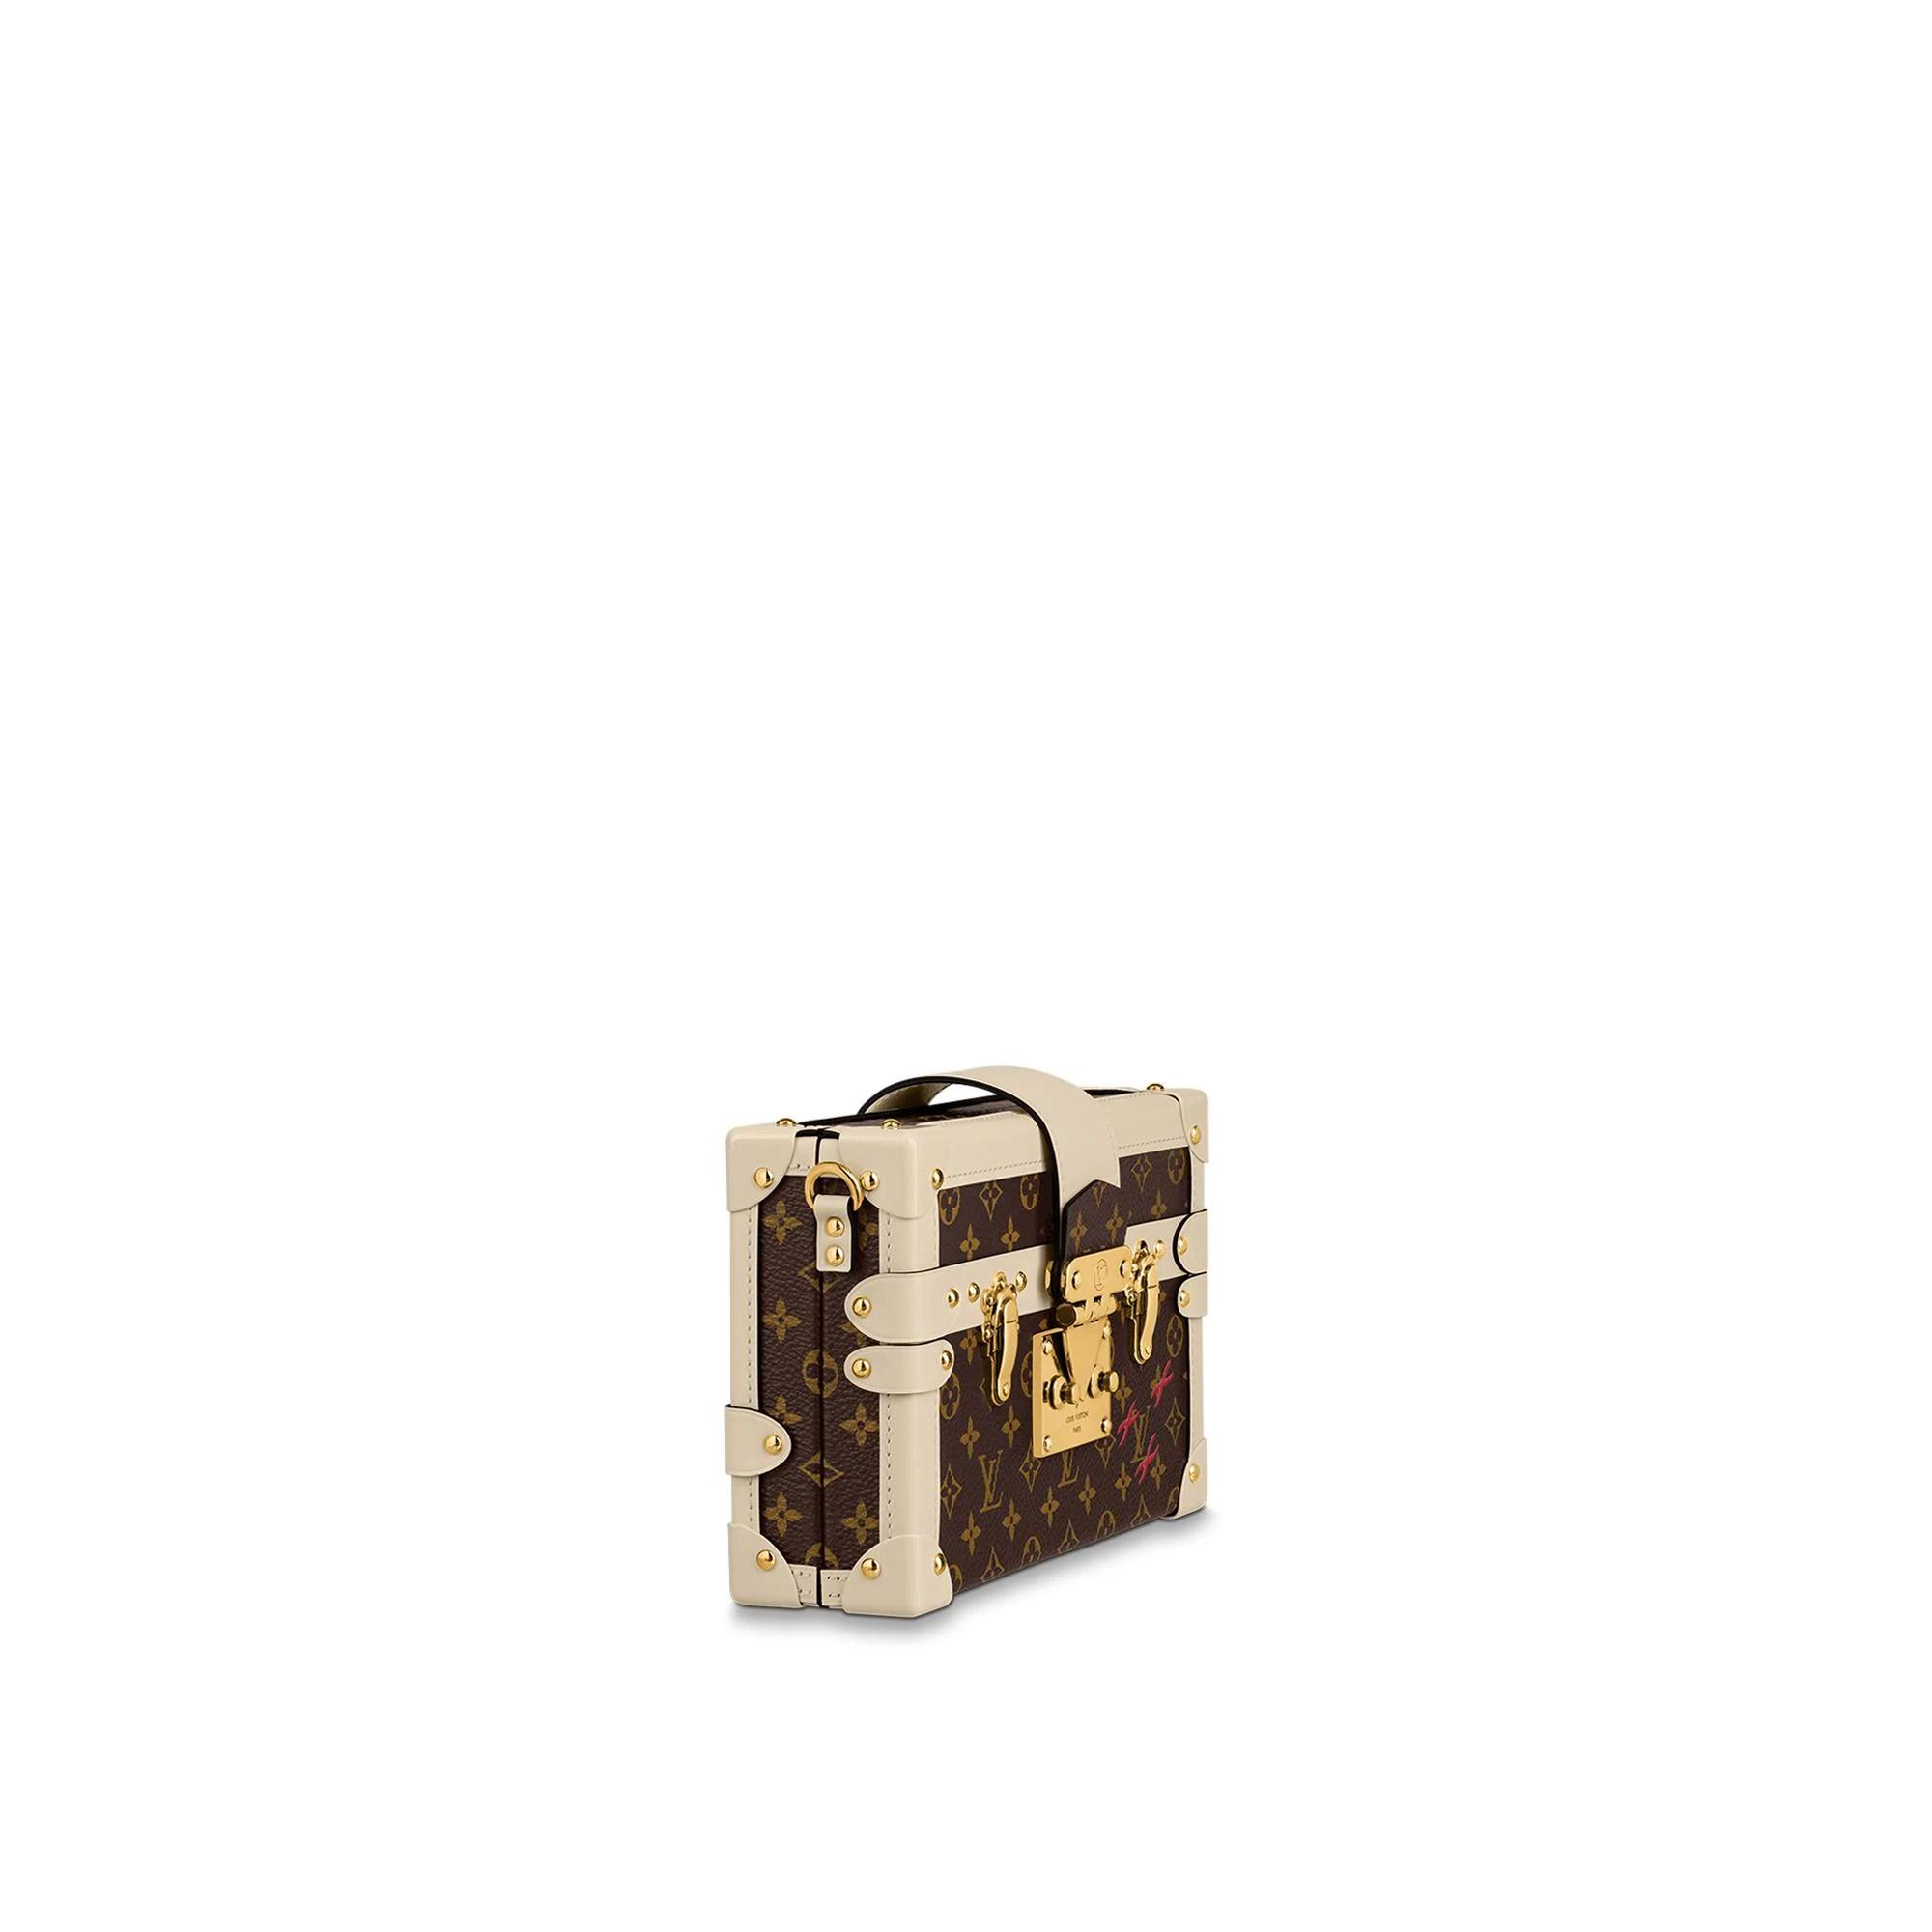 Petite Malle Monogram 帆布 - 時尚手袋 | LOUIS VUITTON